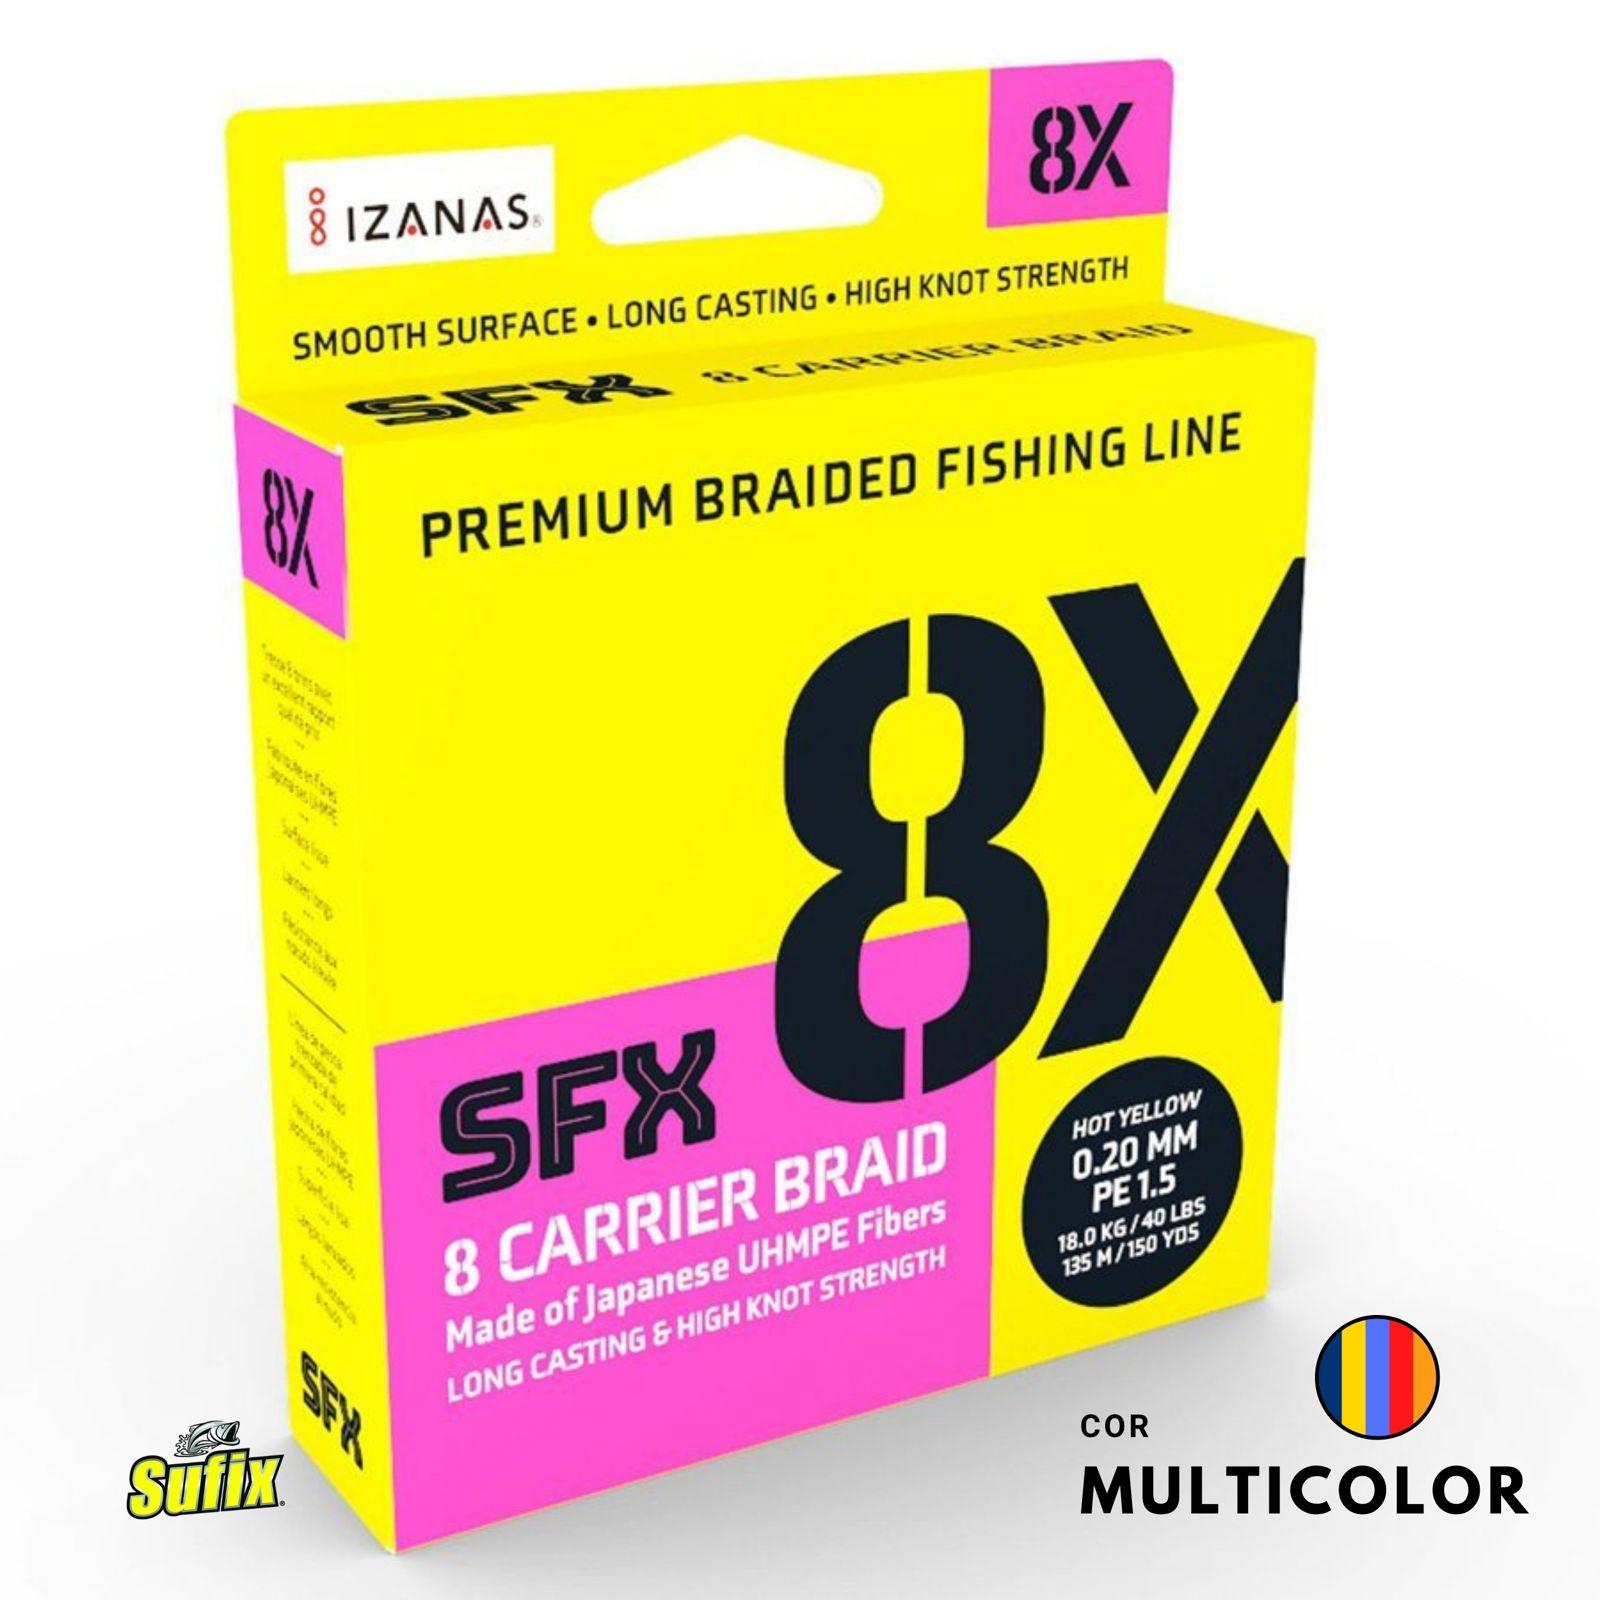 Linha Multifilamento SUFIX SFX 8 CARRIER BRAID 0,18mm - 28lbs - 270 Metros - Multicolor